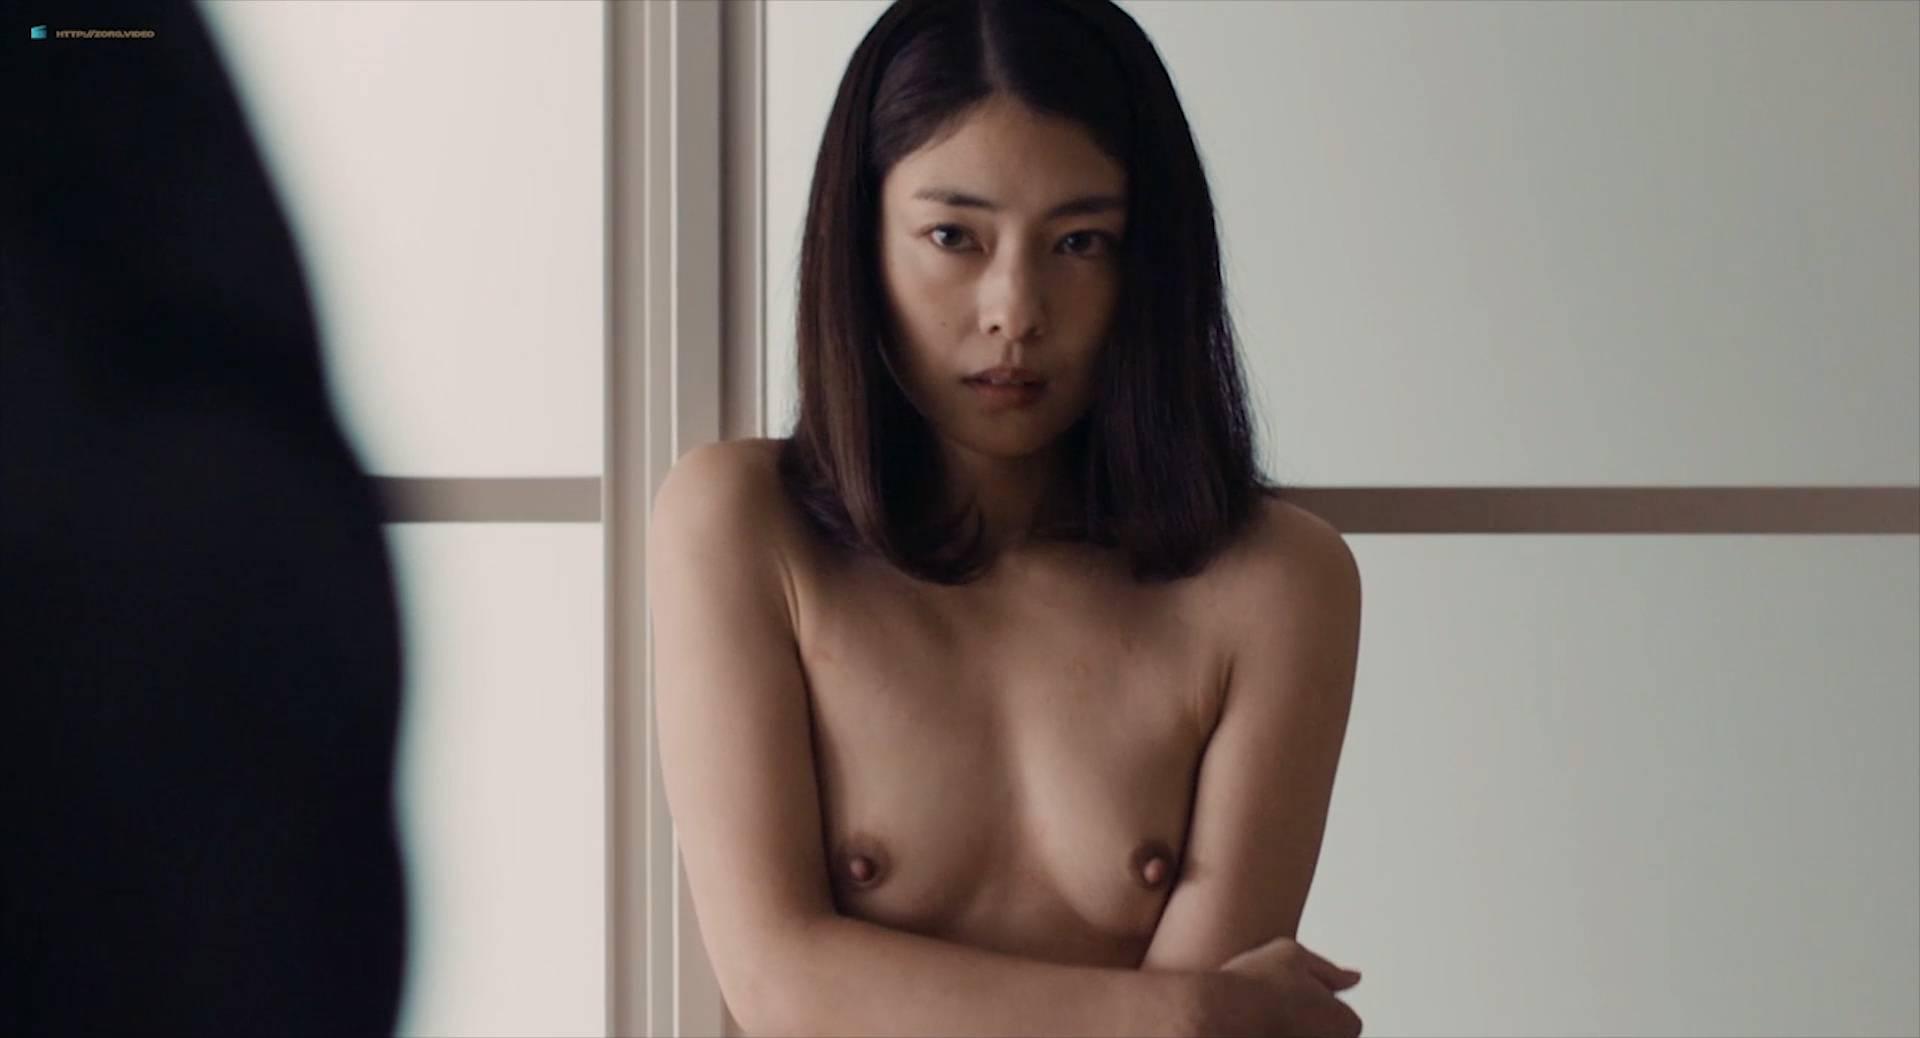 Kokone Sasaki nude hot sex Ayano Moriguchi and Aina Yamada all nude sex too - The Lowlife (JP-2017) HD 1080p (13)